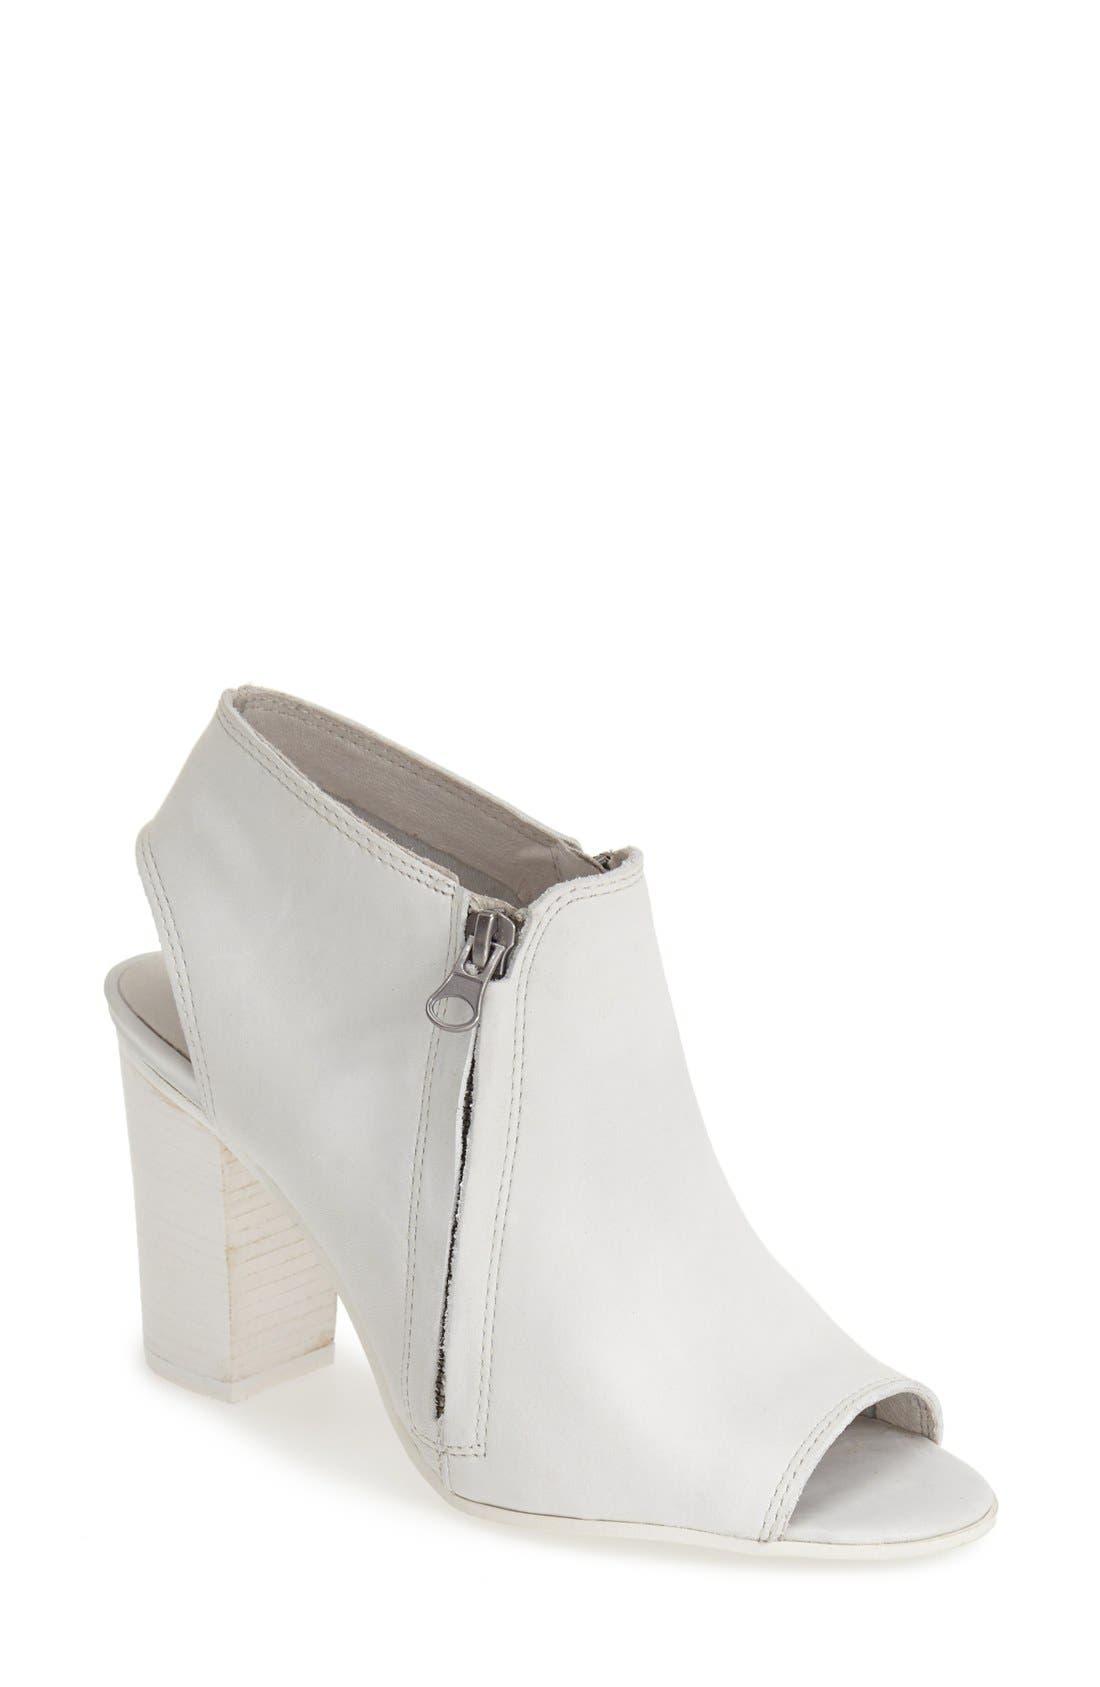 Alternate Image 1 Selected - Matisse 'Dolan' Open Toe Boot (Women)